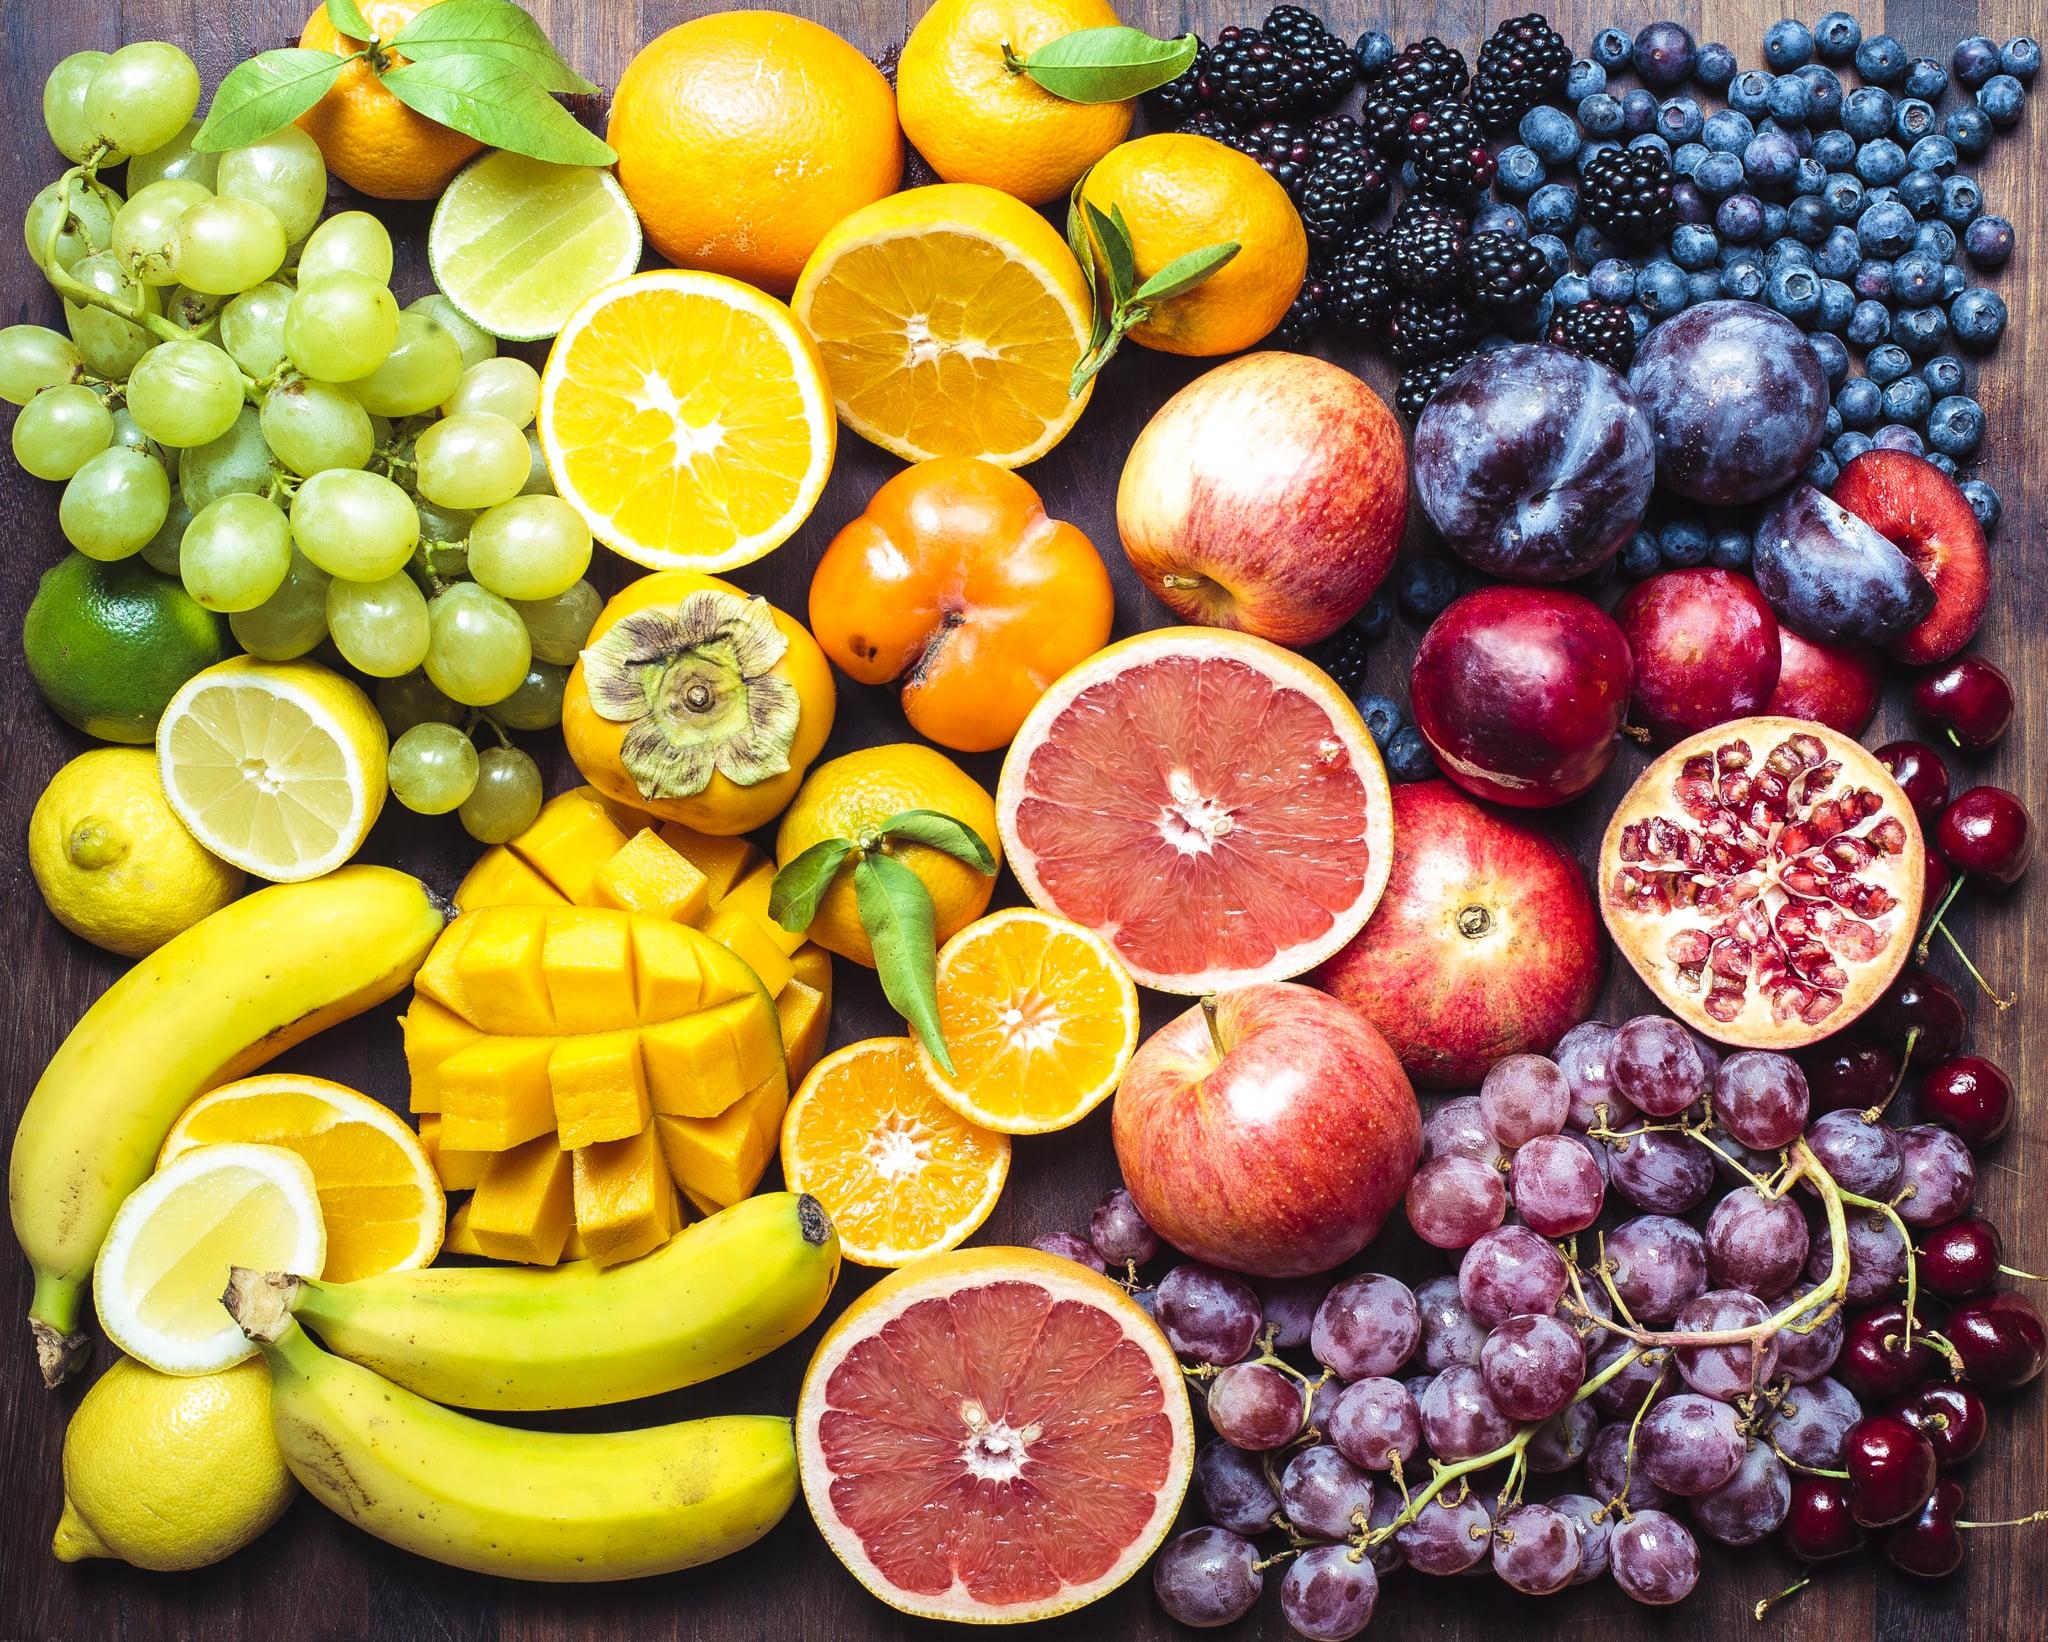 A colourful spectrum of fruit: oranges, lemons, limes, mandarins, grapes, plums, grapefruit, pomegranate, persimmons, bananas, cherries, apples, mangoes, blackberries and blueberries.